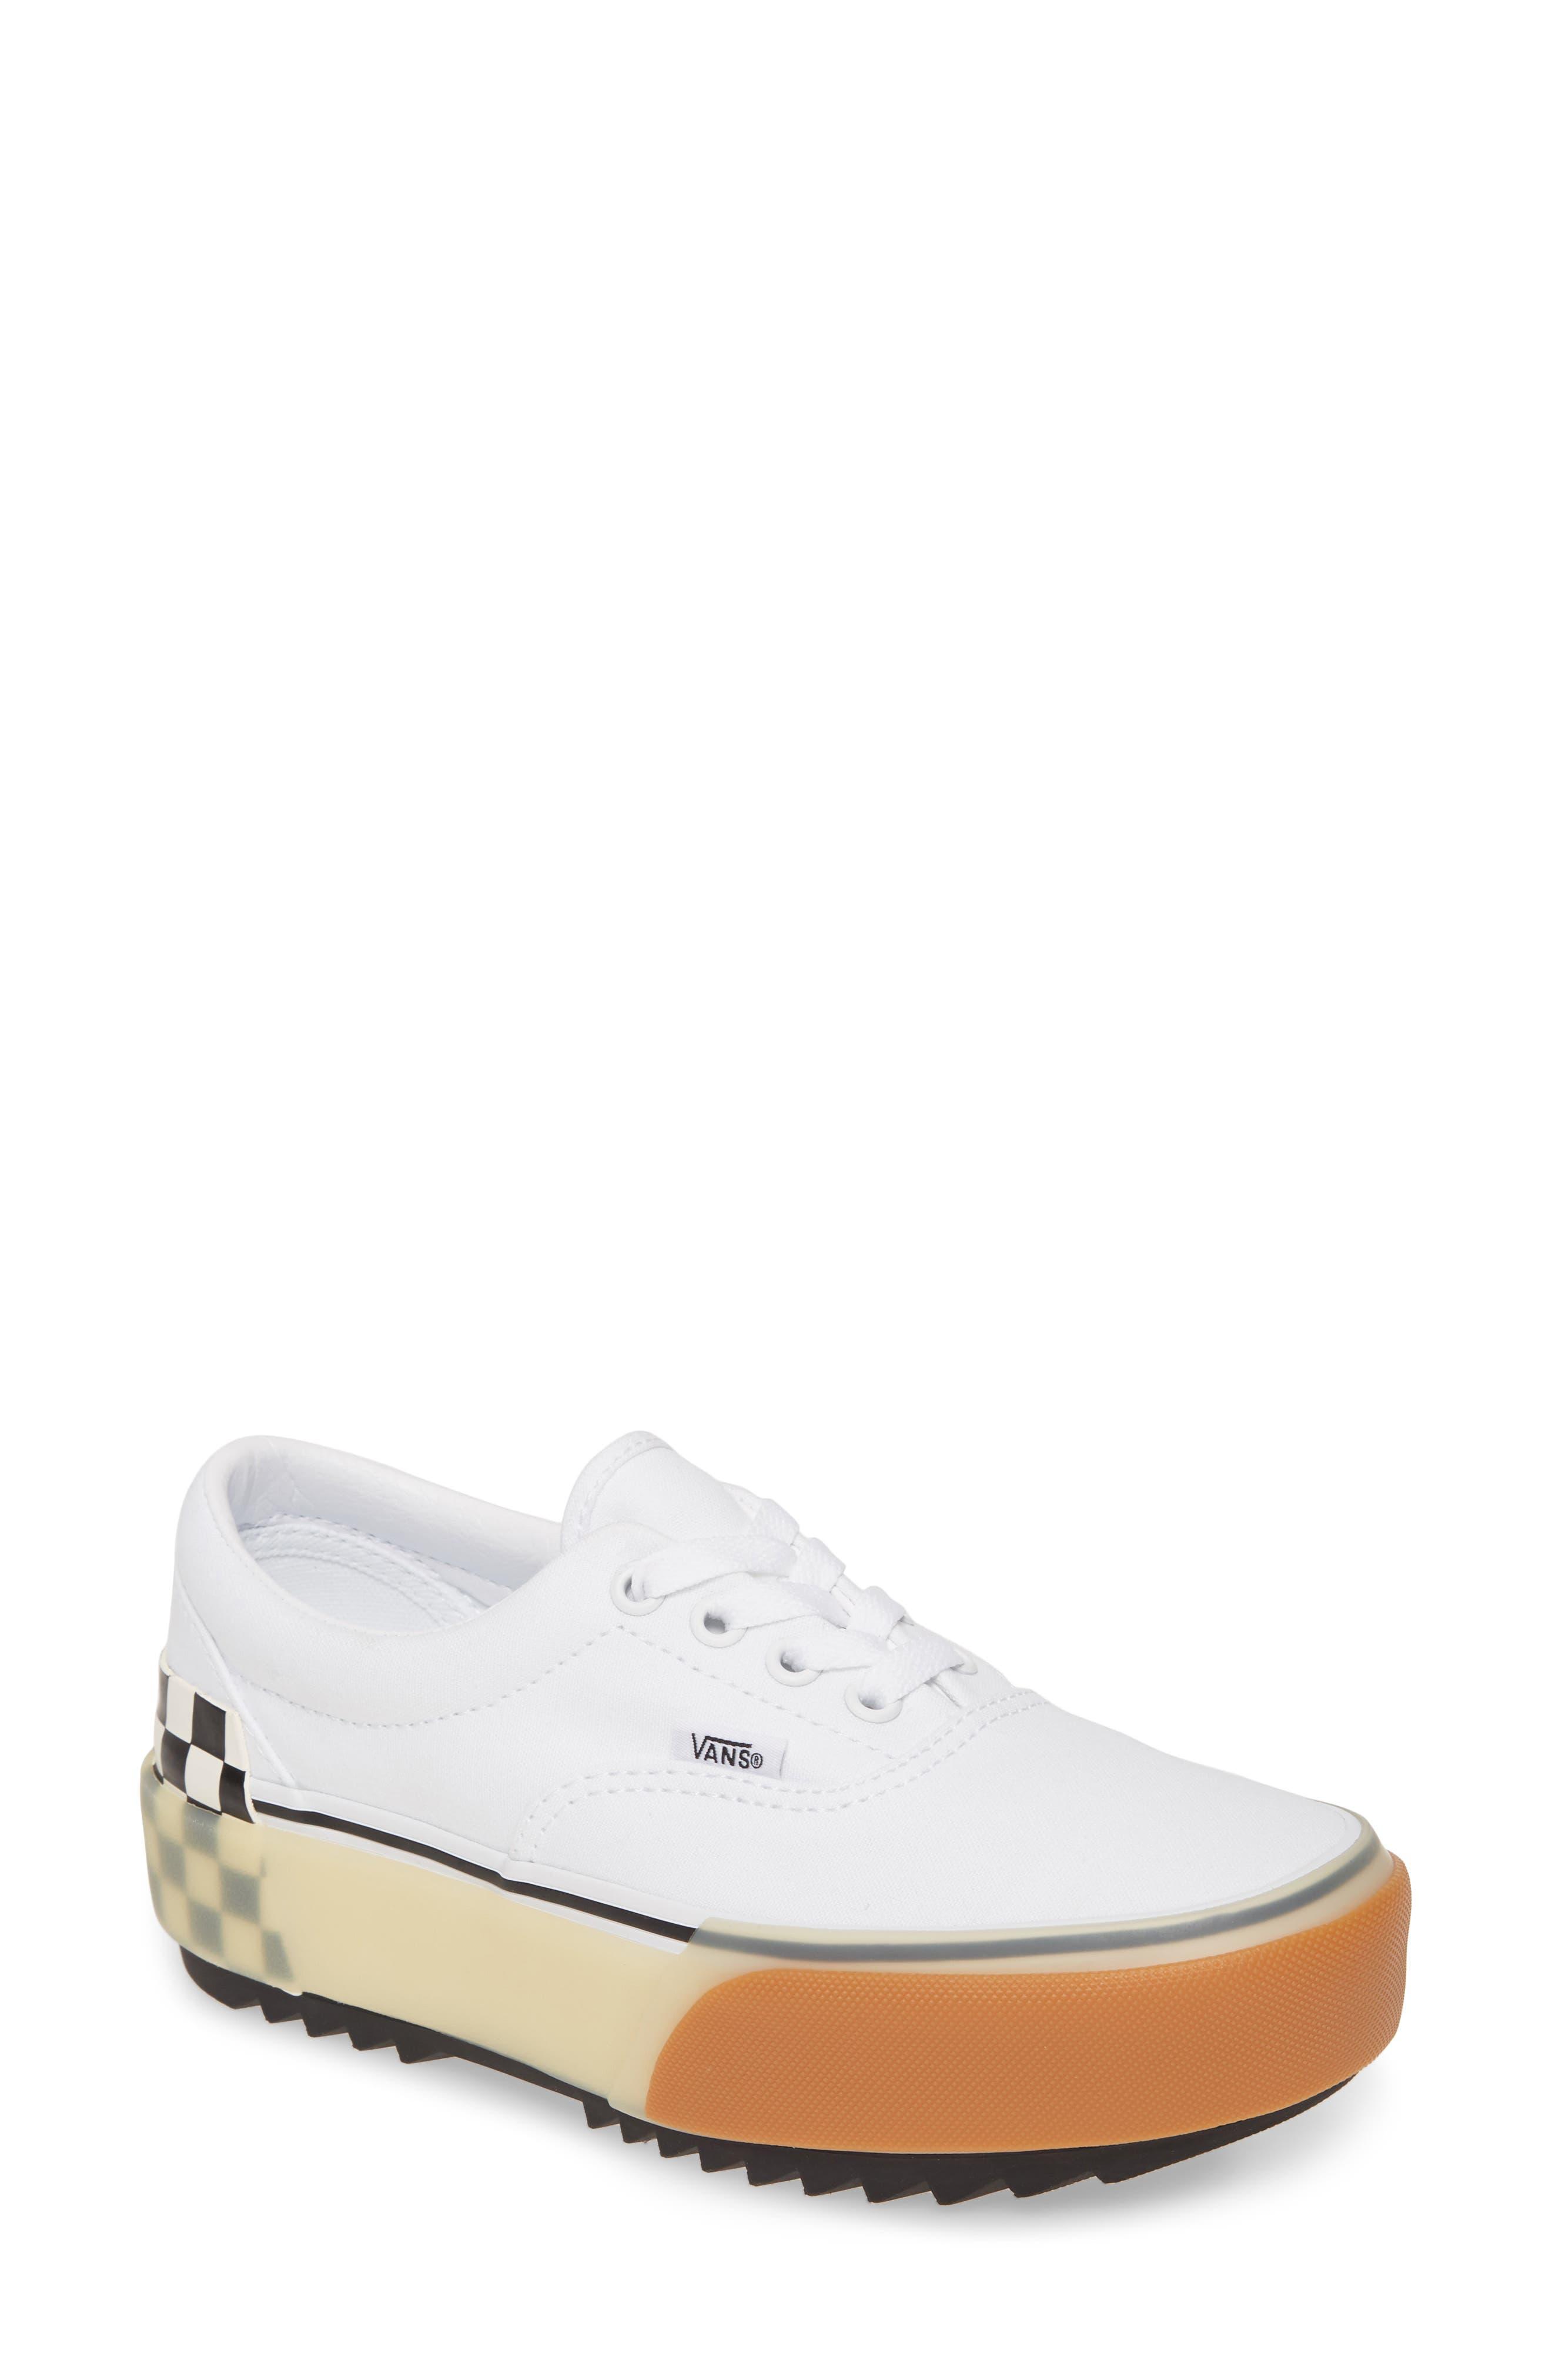 Vans Era Stacked Check Platform Sneaker, White